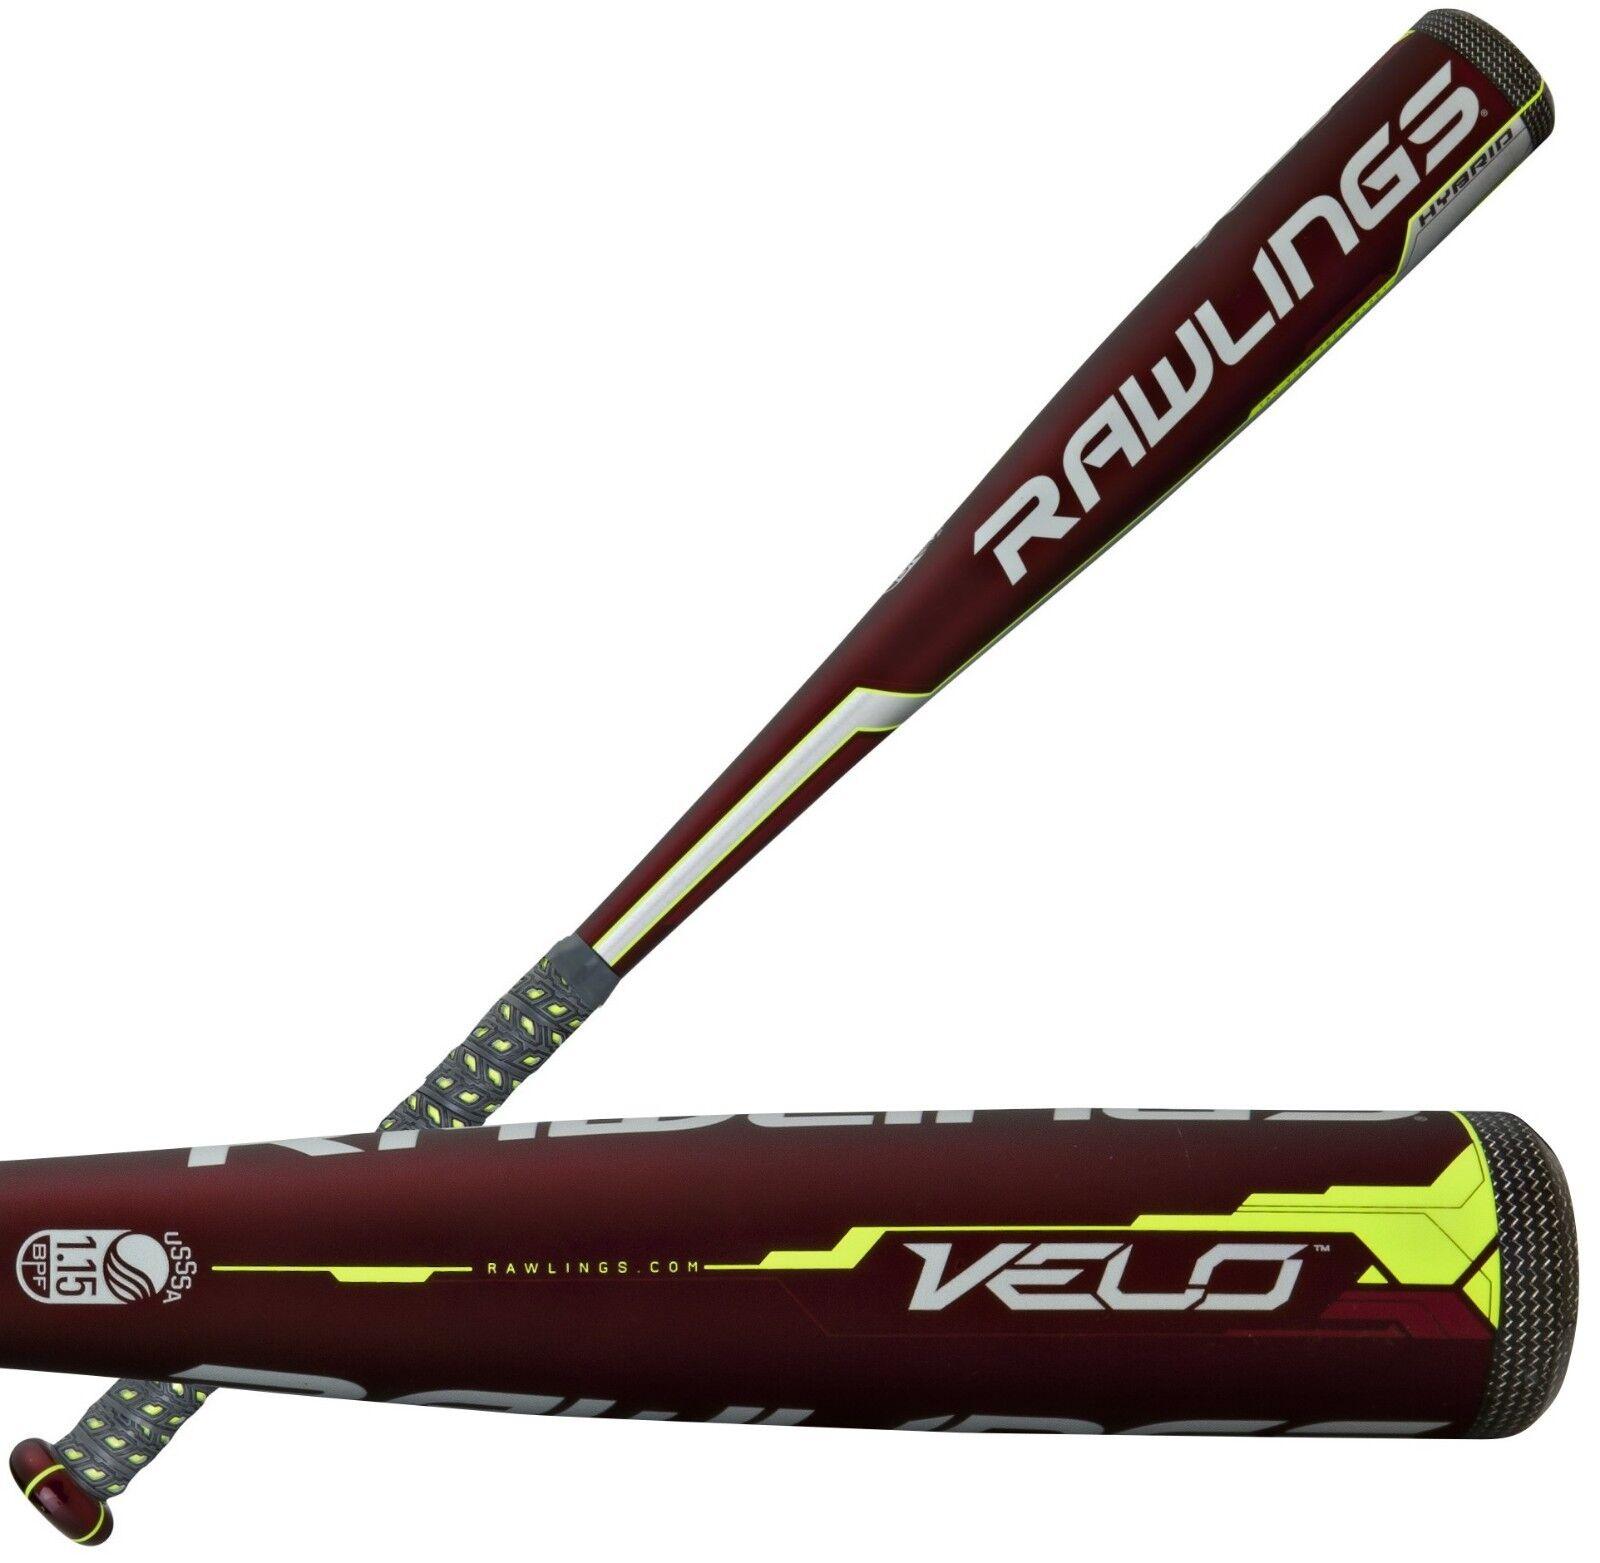 Rawlings velo -10 30  20 OZ Juvenil Senior Liga bate de béisbol SL7V10